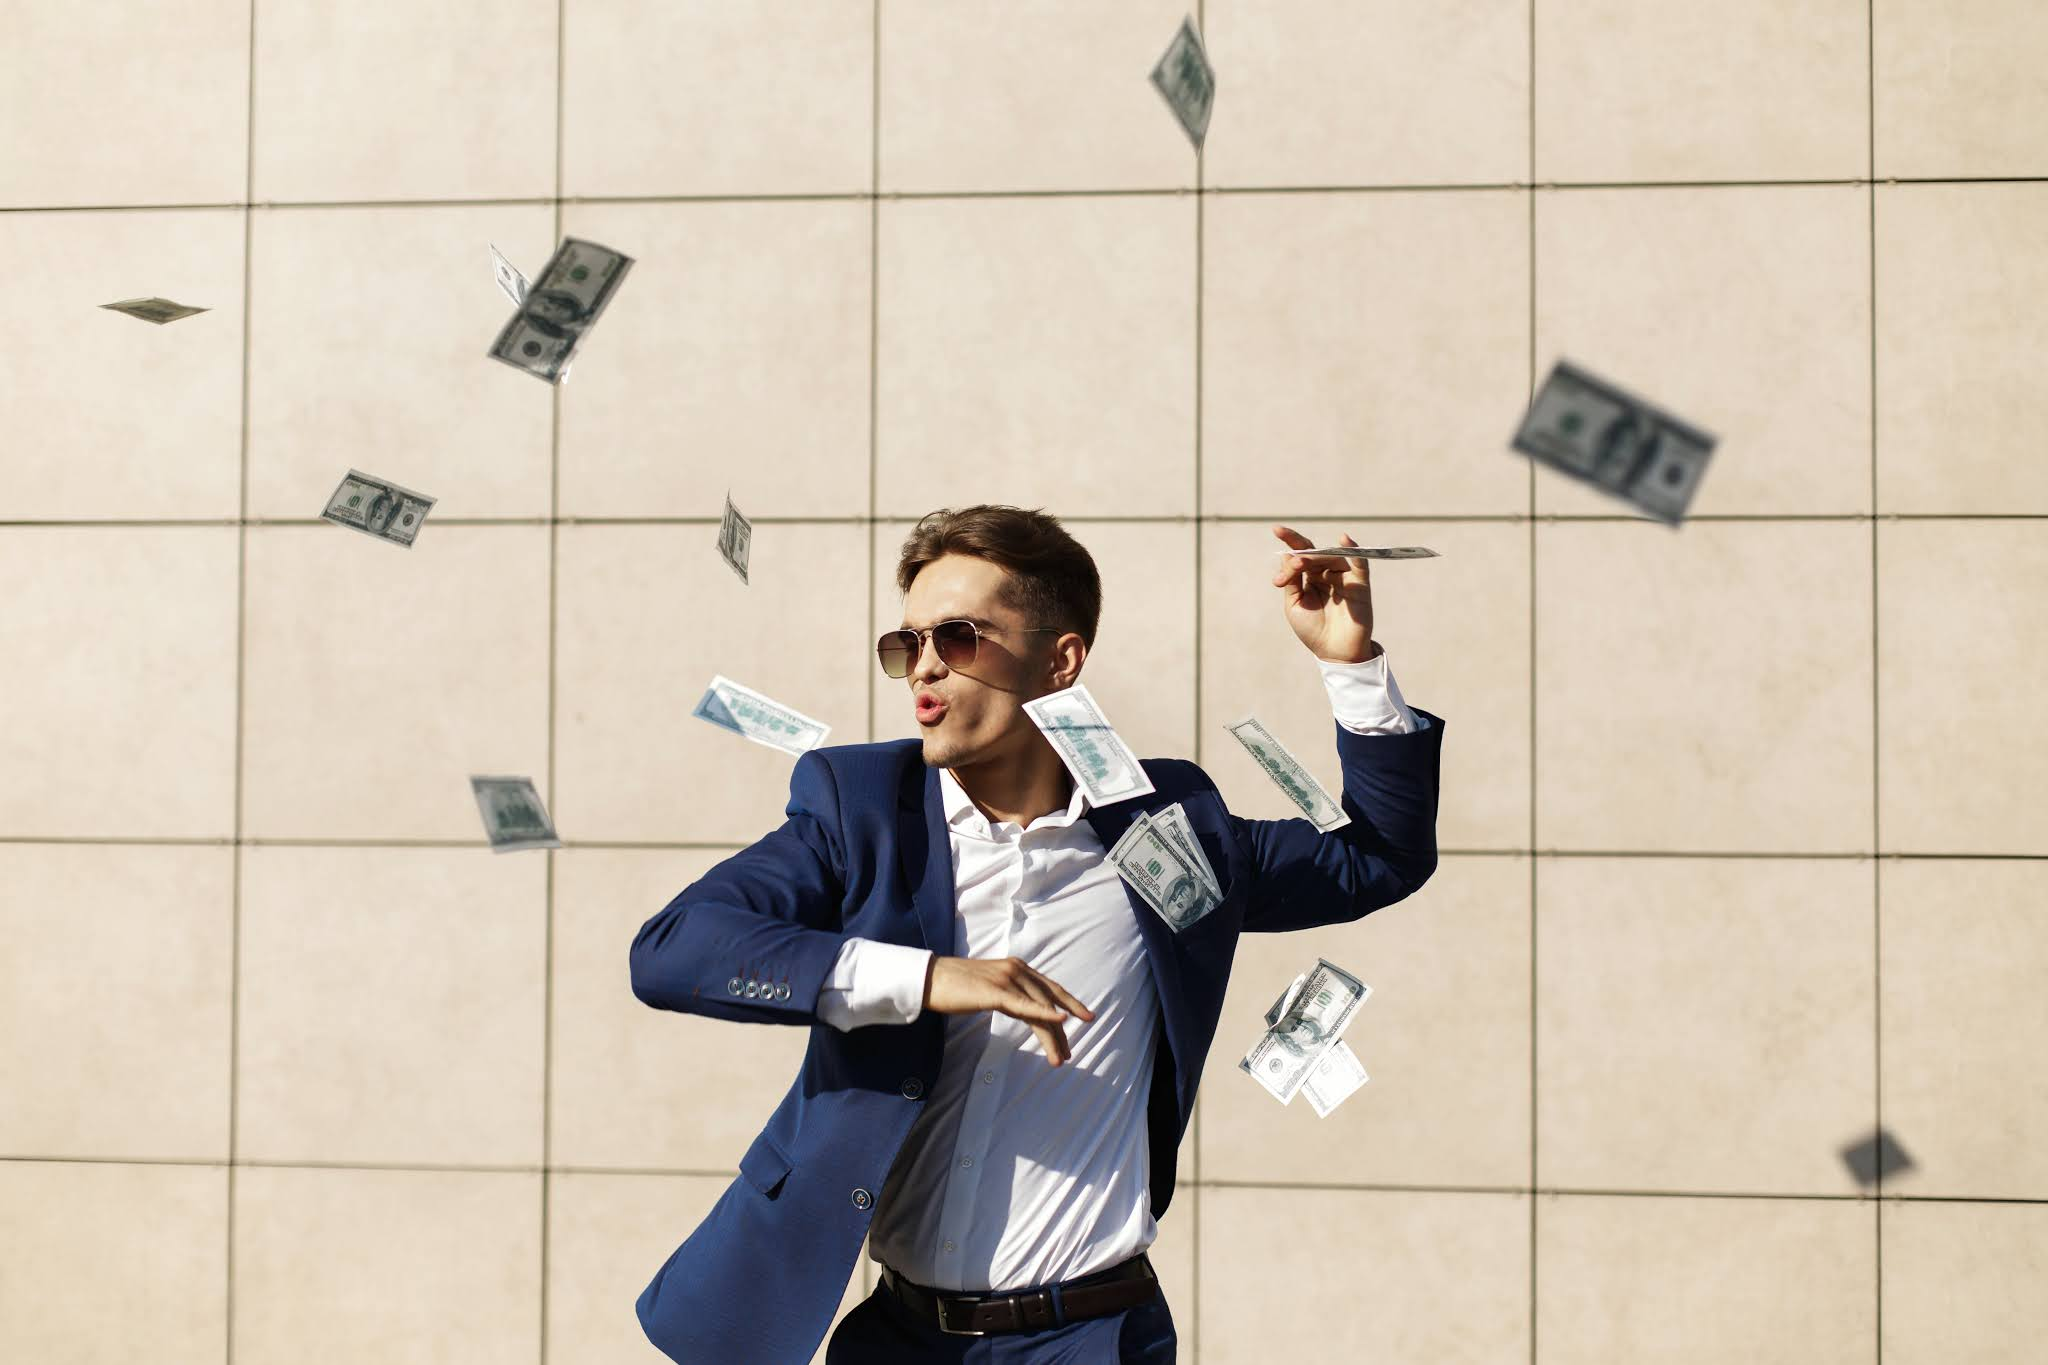 young businessman throughs around dollars dances street min